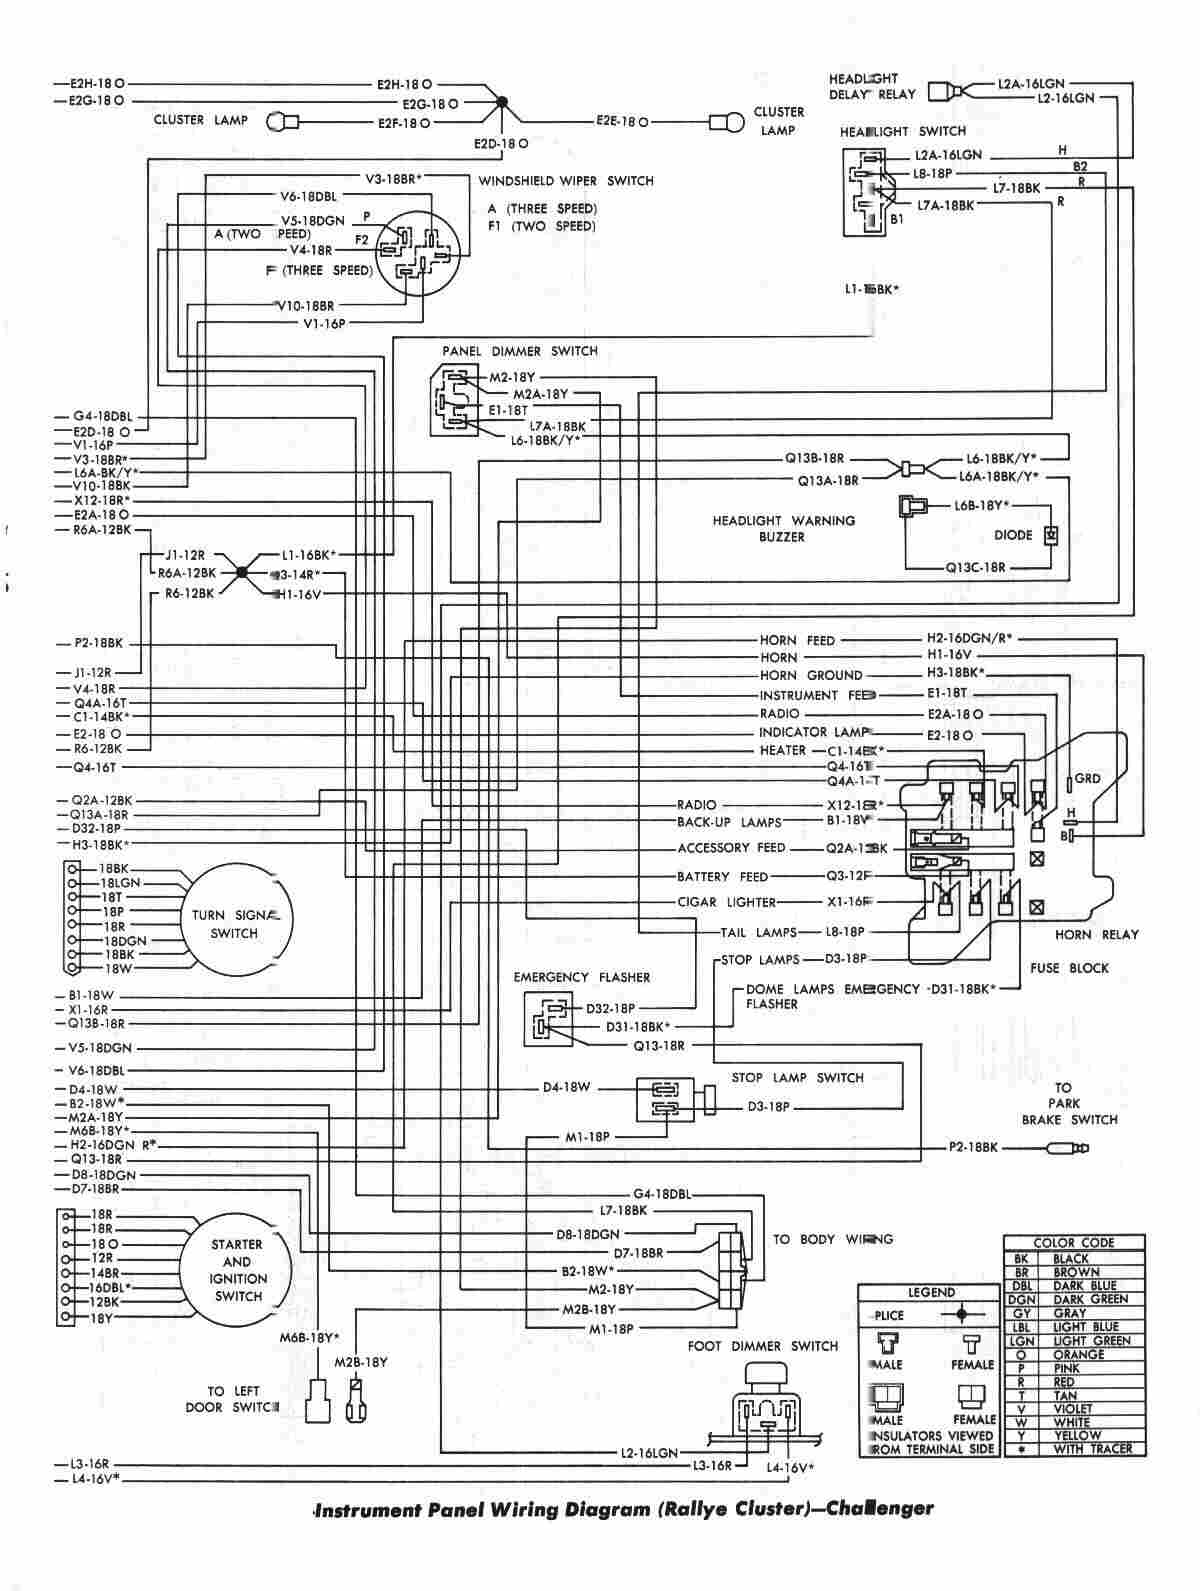 Dodge+Challenger+1970+Instrument+Panel+Wiring+Diagram+(Rallye+Cluster) weathertron thermostat wiring diagram roslonek net,Heat Lamp Wiring Diagram